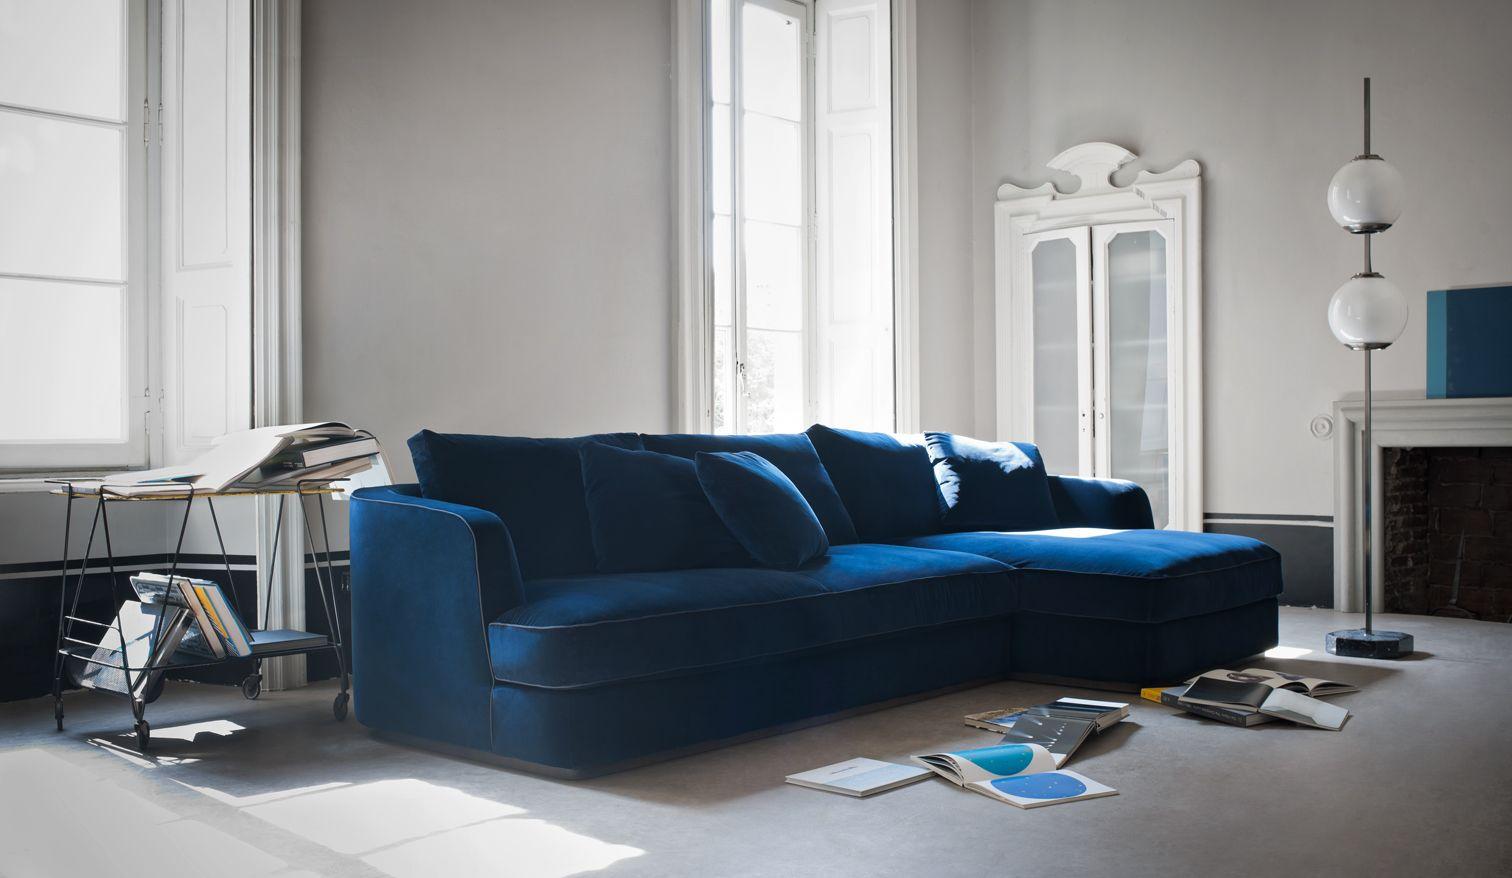 Barret sectional sofa design by Roberto Lazzeroni for Flexform Mood. made in Italy. : flexform sectional sofa - Sectionals, Sofas & Couches